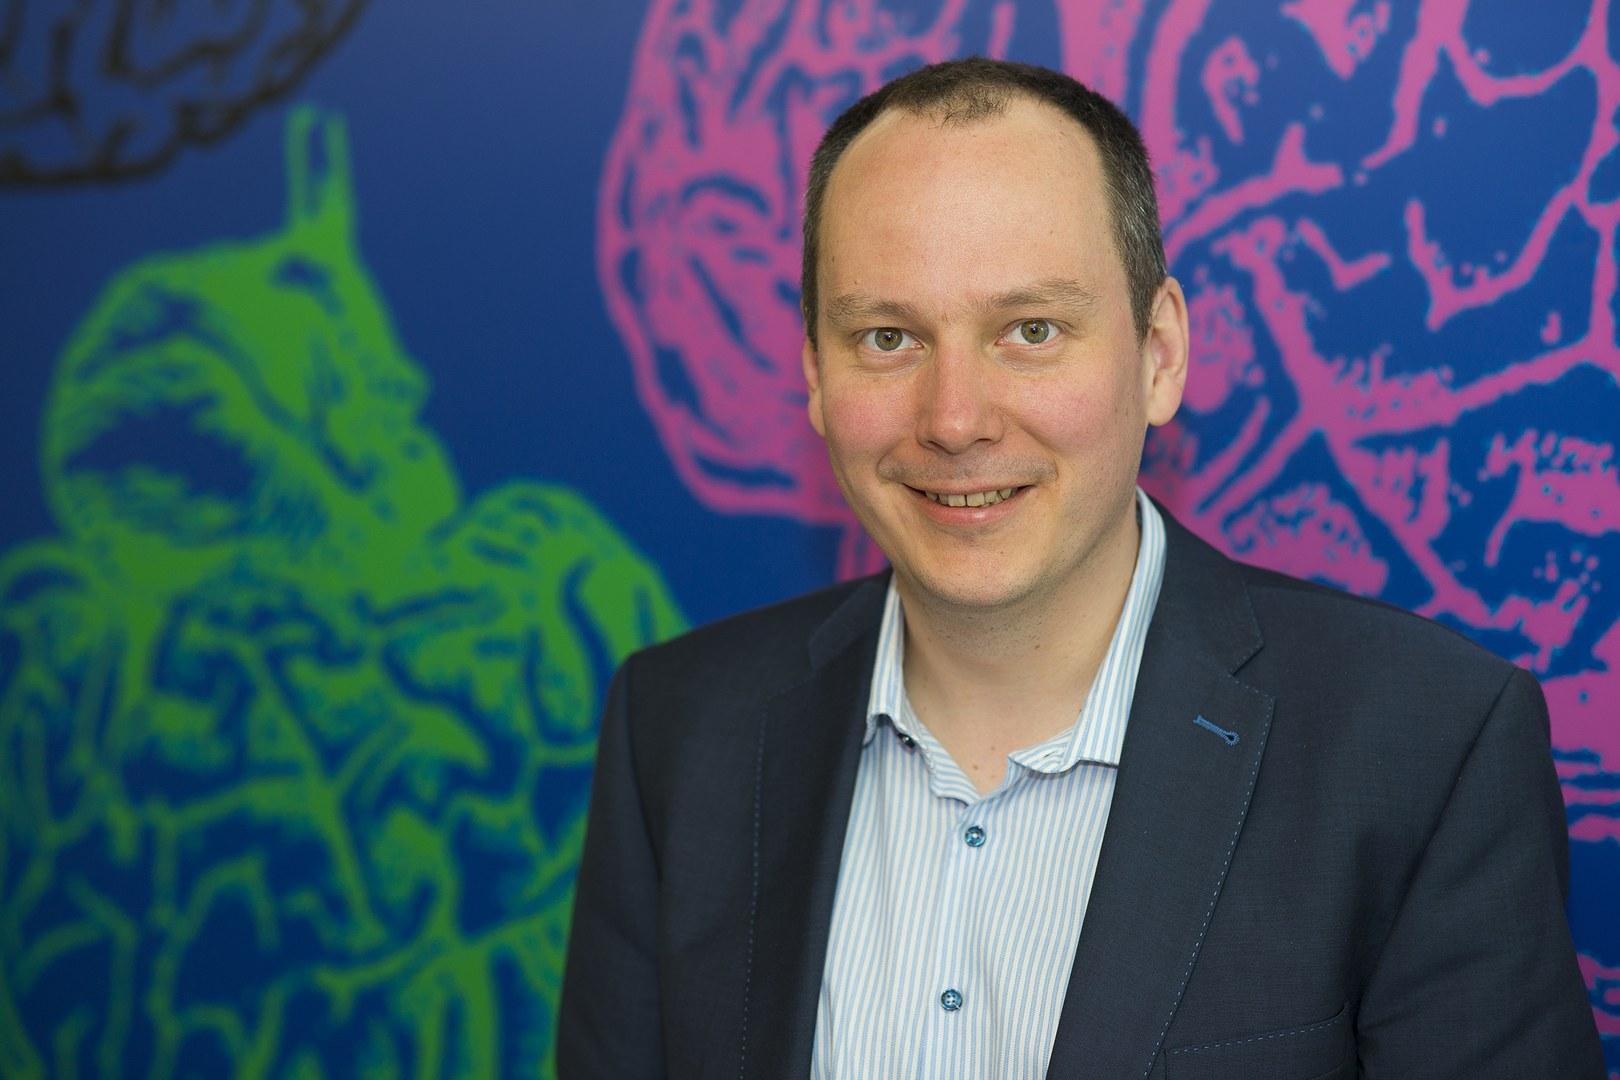 Prof. Dr. Bernd Weber